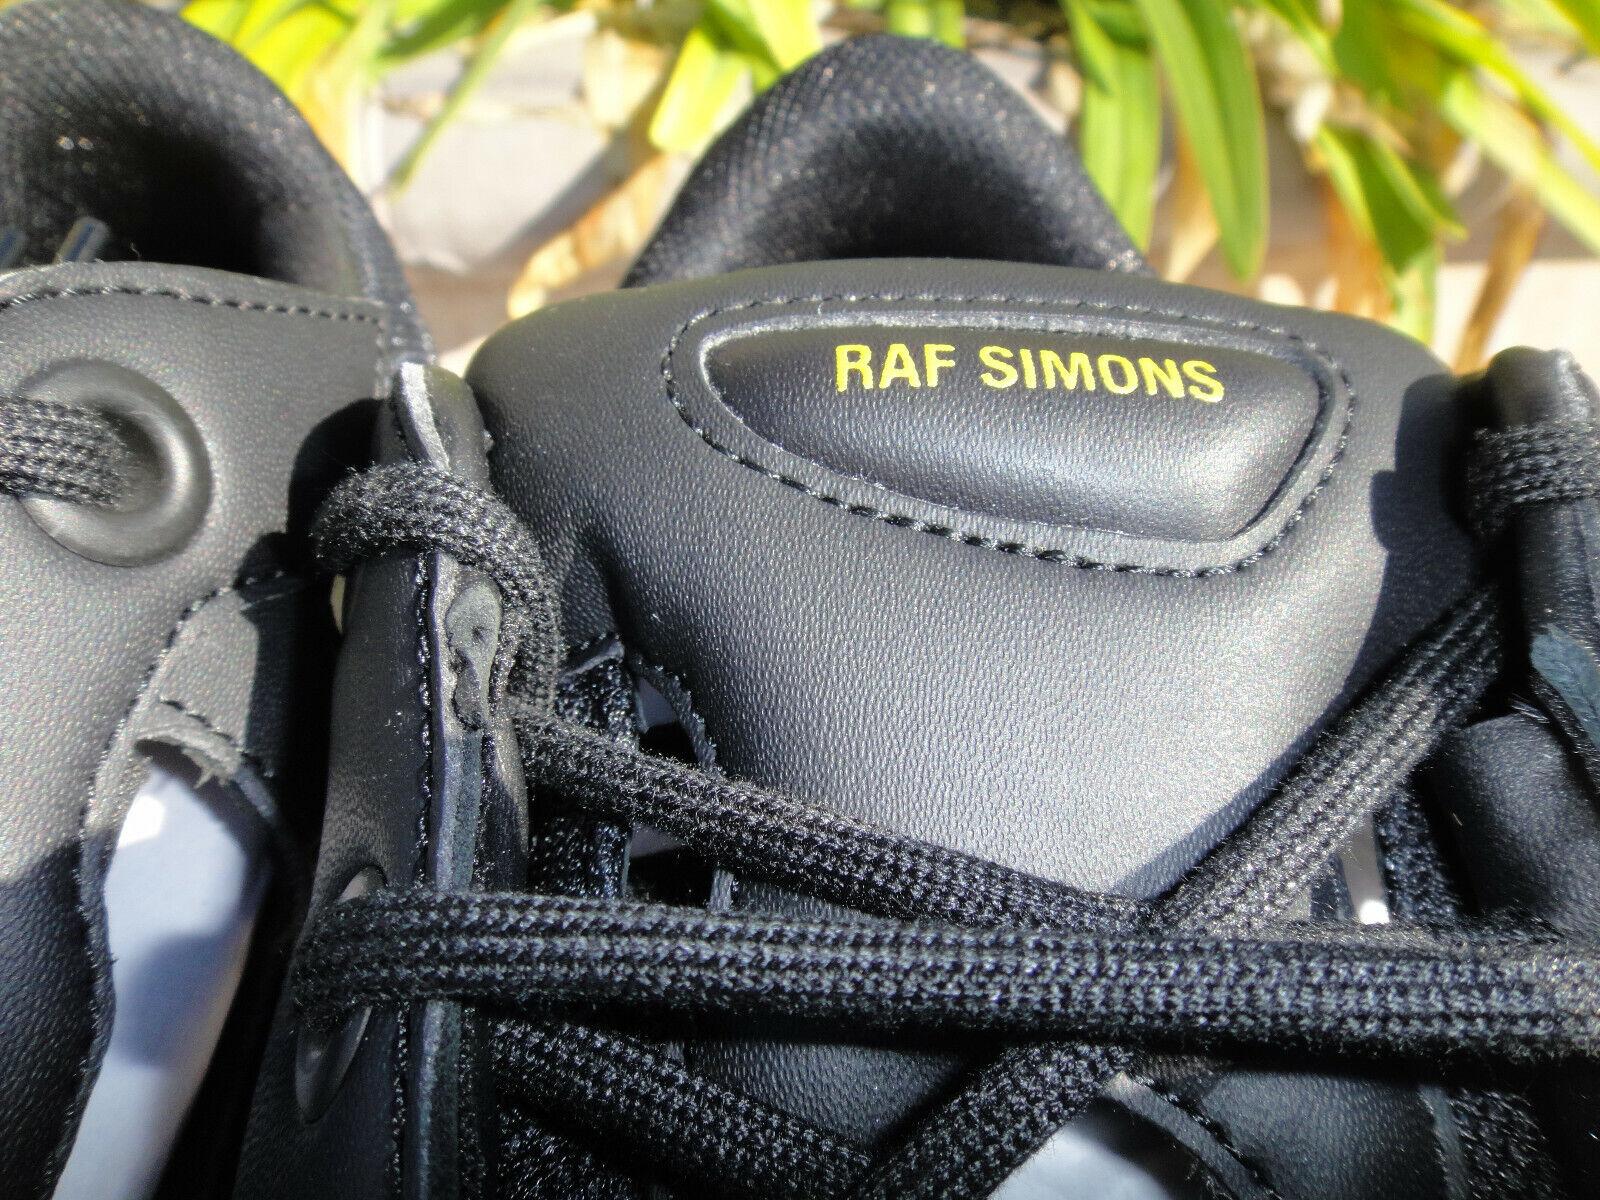 12fd2f99b092b ... Adidas x Raf Simons OZWEEGO OZWEEGO OZWEEGO REPLICANT BELGIUM Box Set  Sneakers US11 Men s F34234 ddcbcd ...